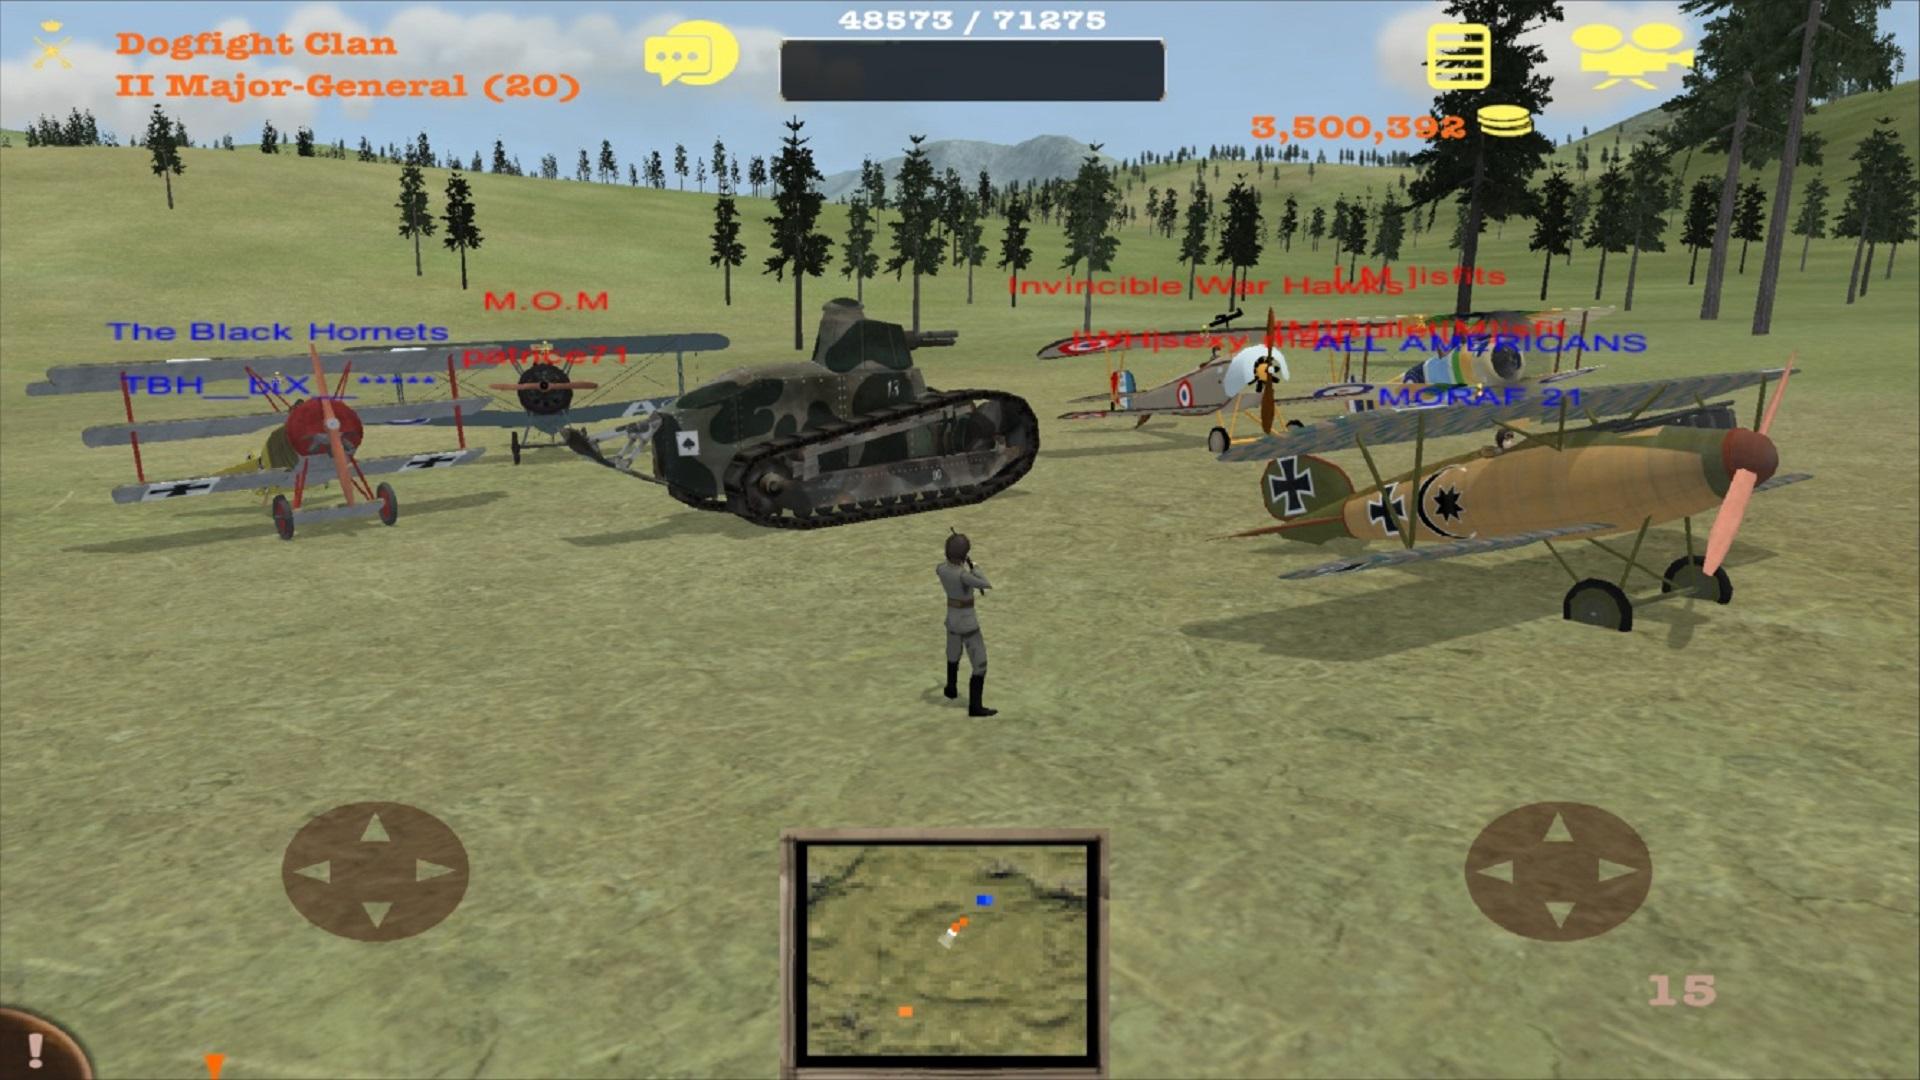 Oculus Quest 游戏《Dogfight Elite VR》混战精英插图(2)